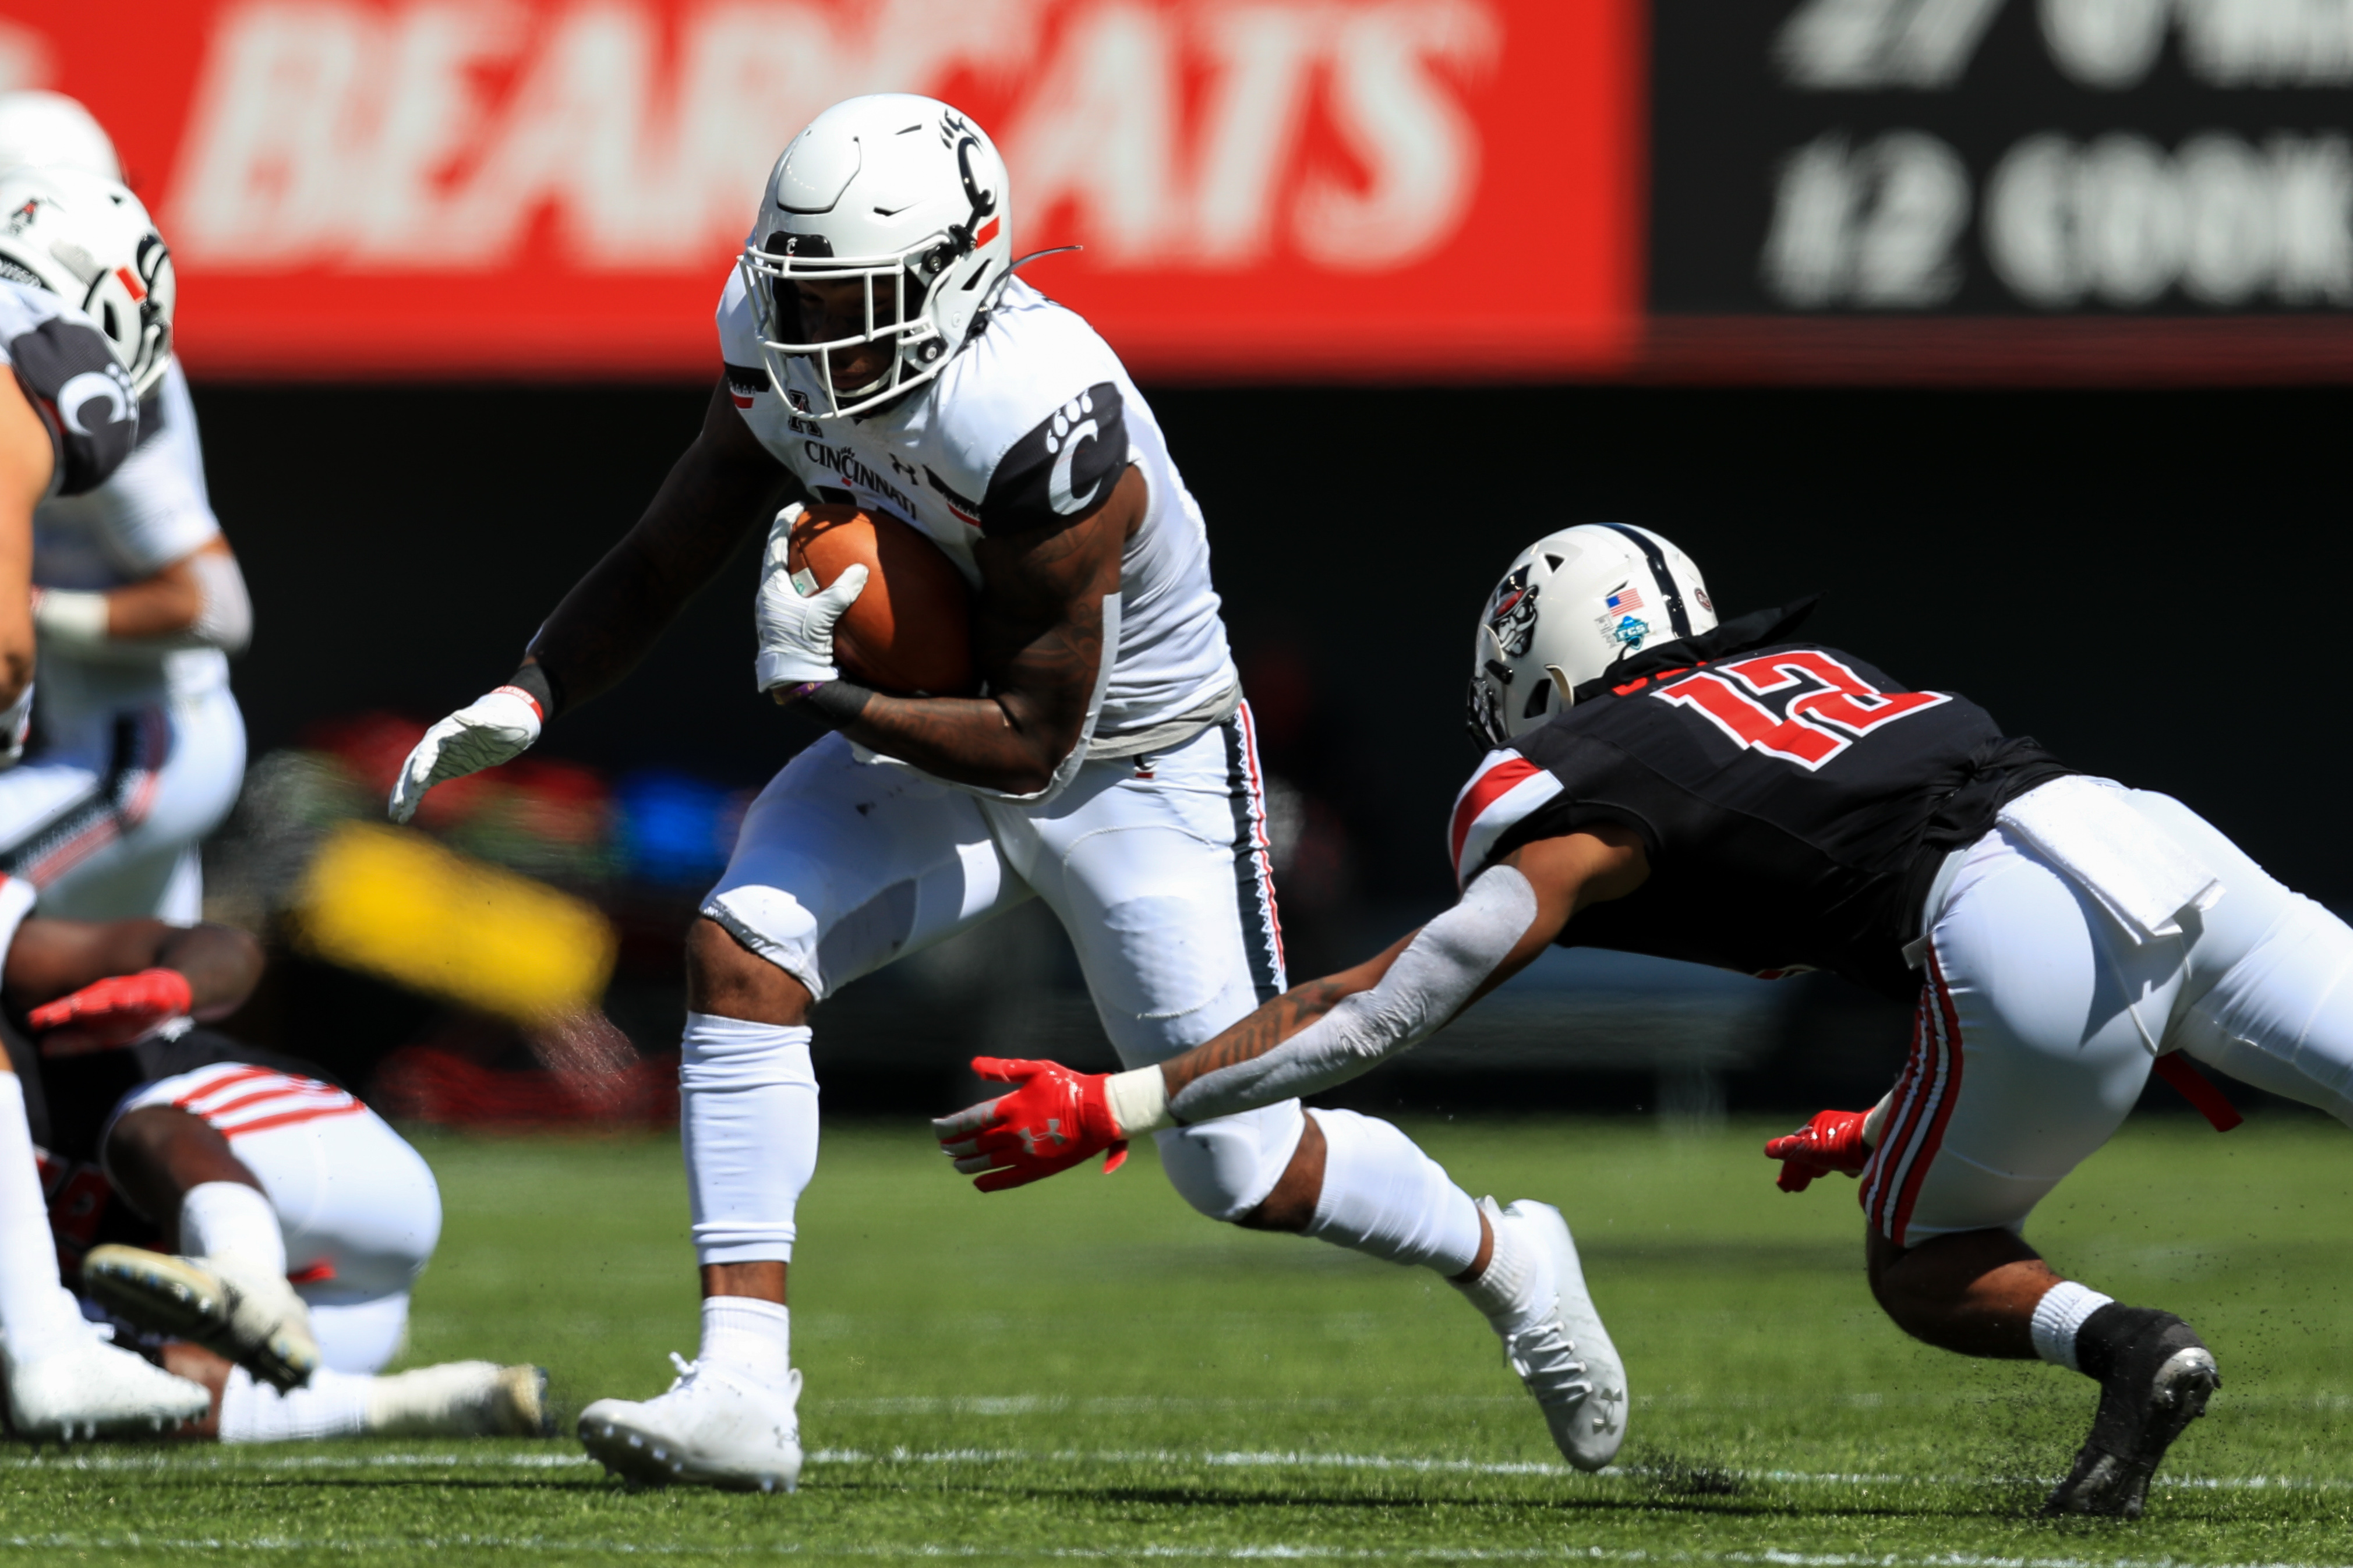 NCAA Football: Austin Peay at Cincinnati